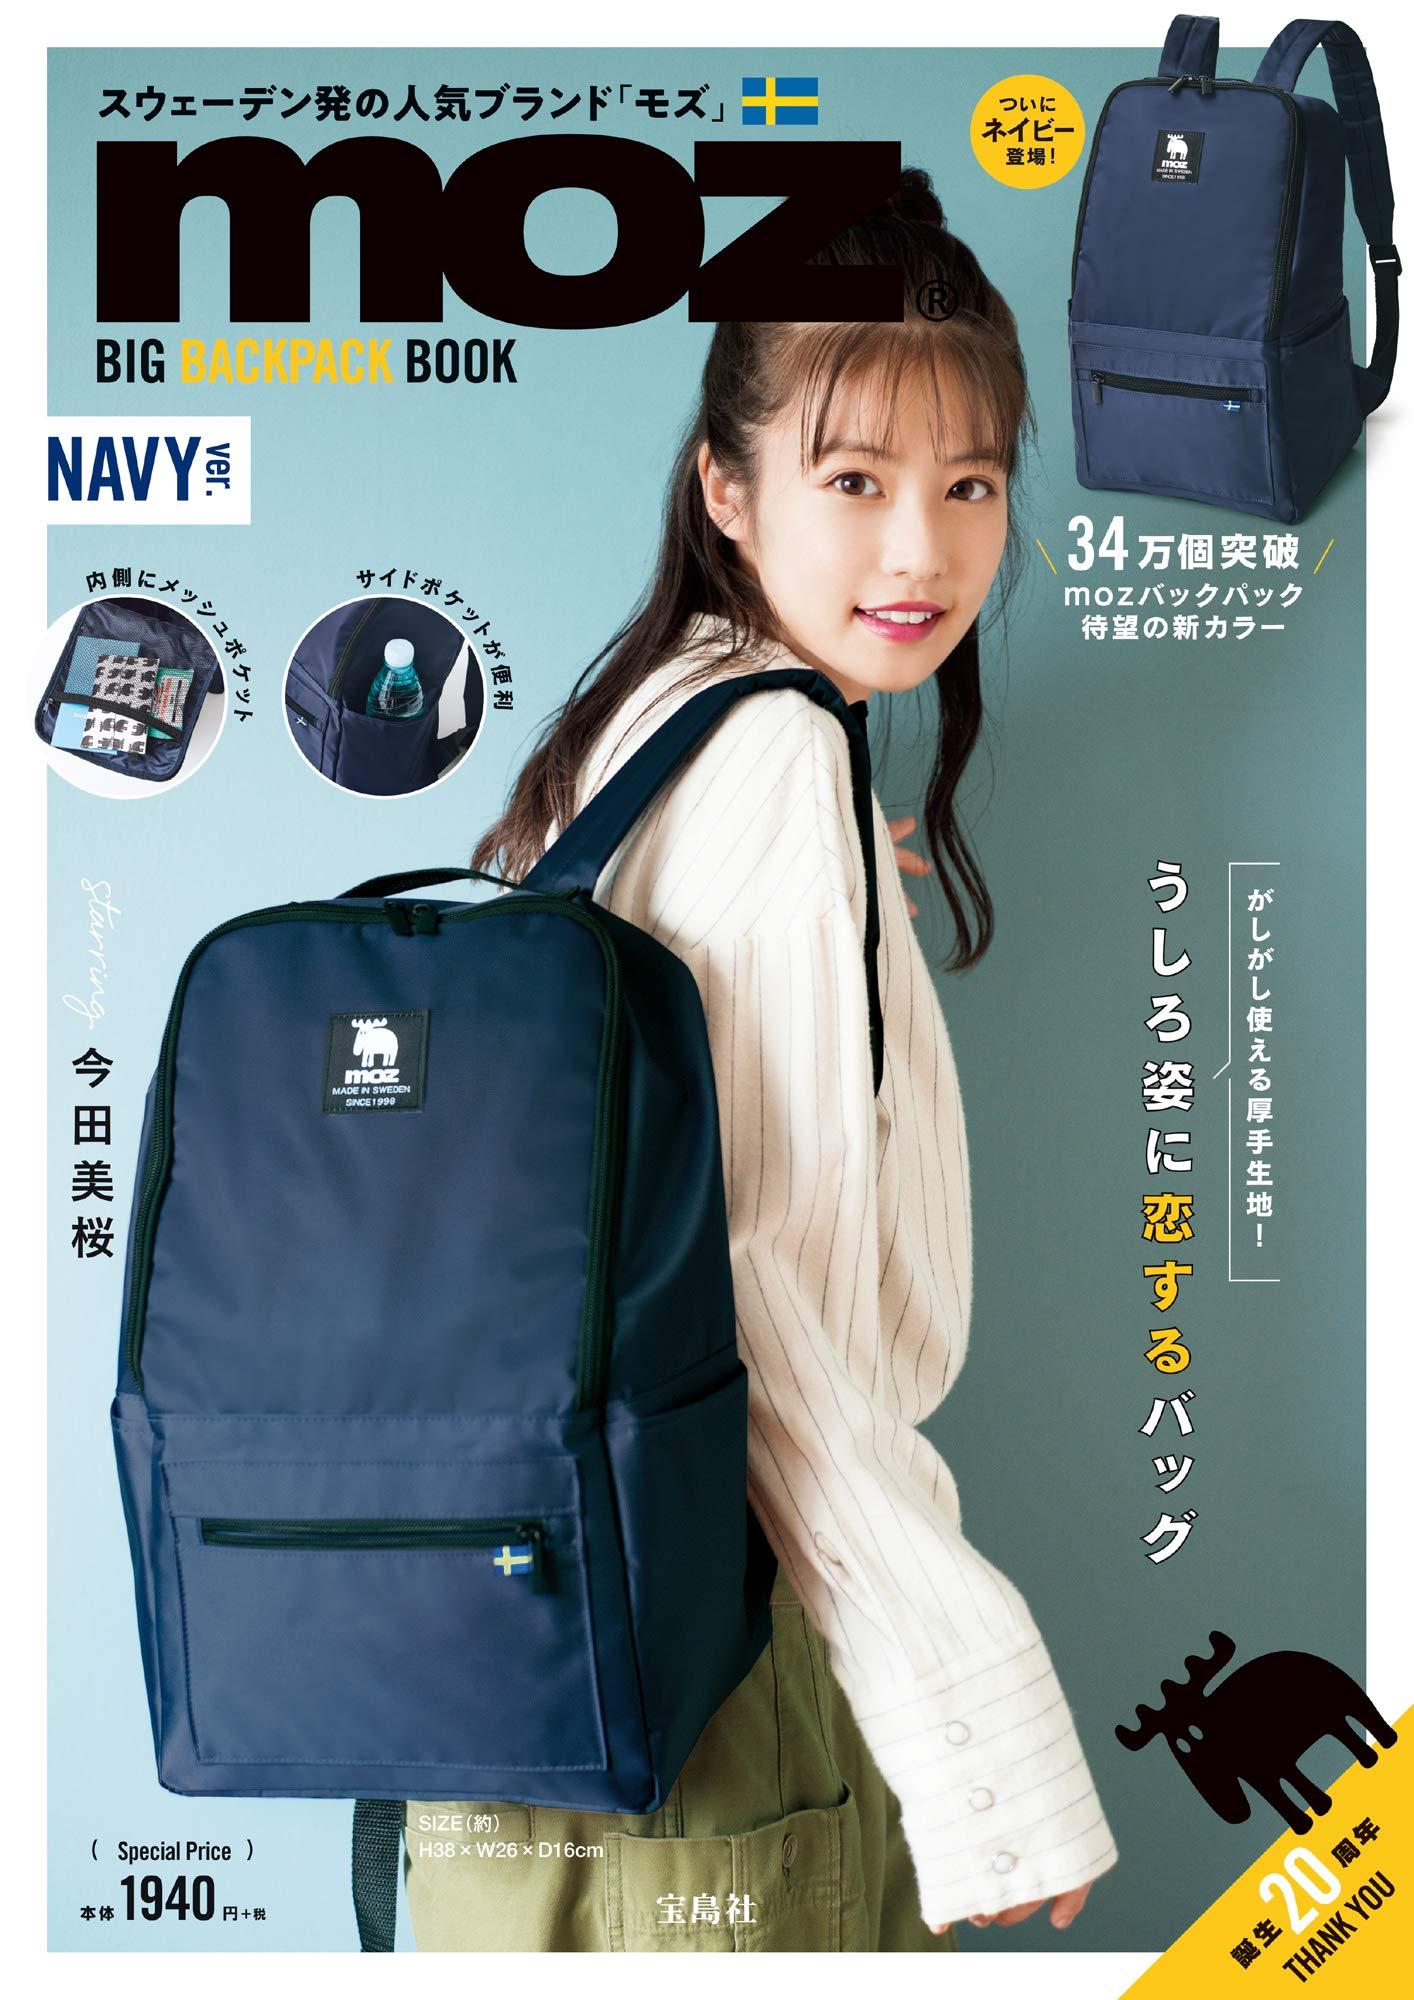 MOZ Big Backpack Book Navy Ver. (Variety) : 9784800288813: Amazon.com: Books